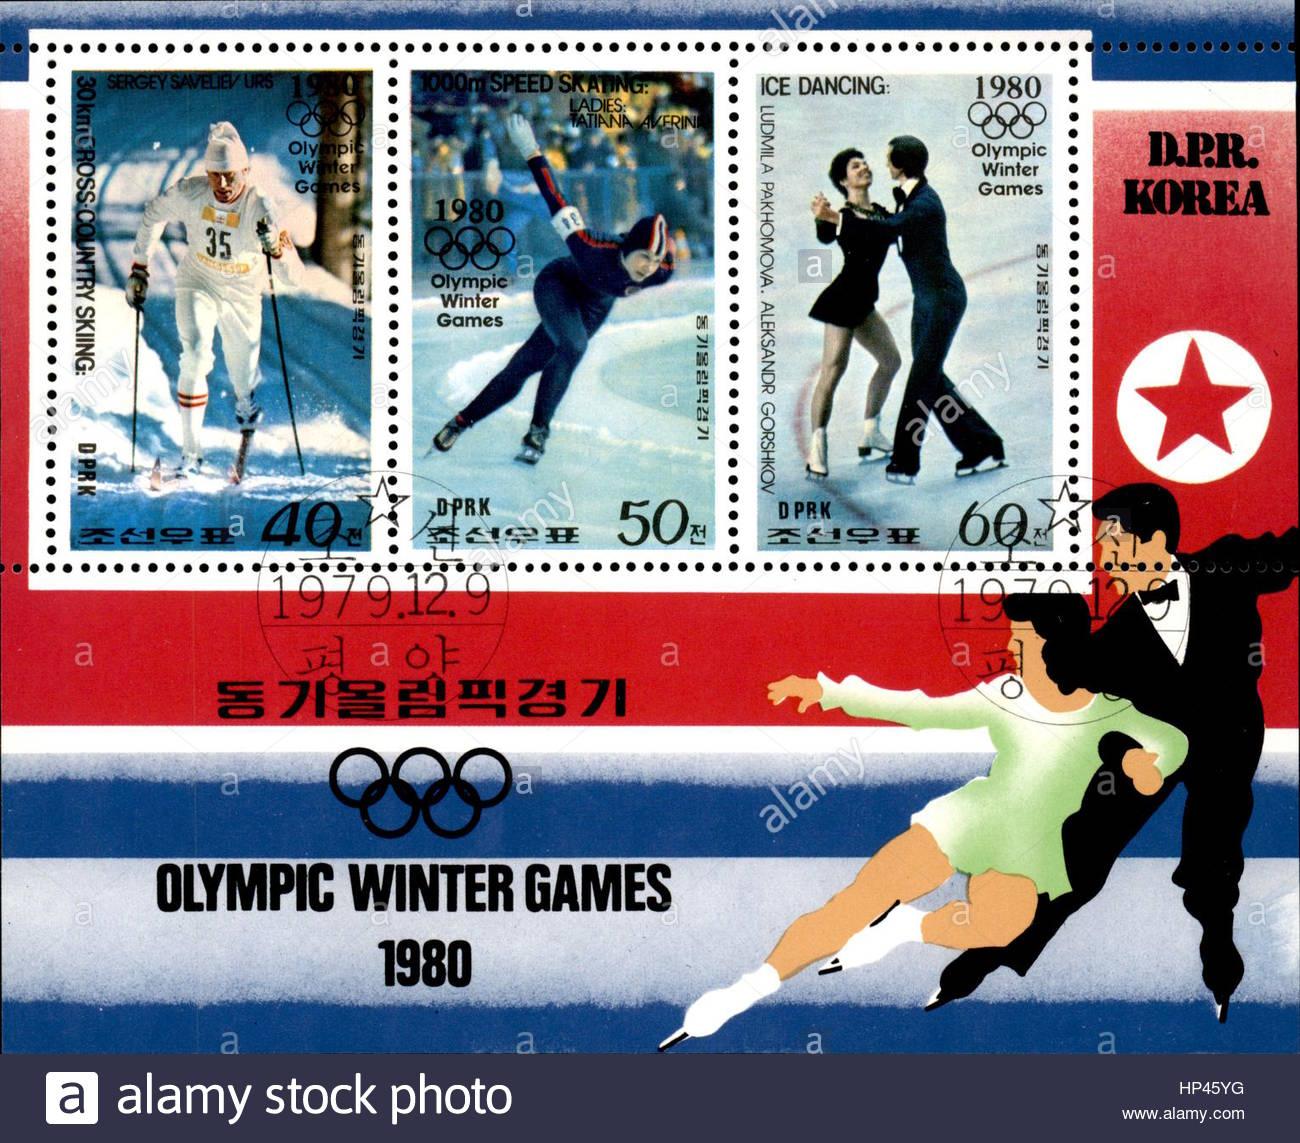 Rare North Korean vintage postage stamp - Stock Image